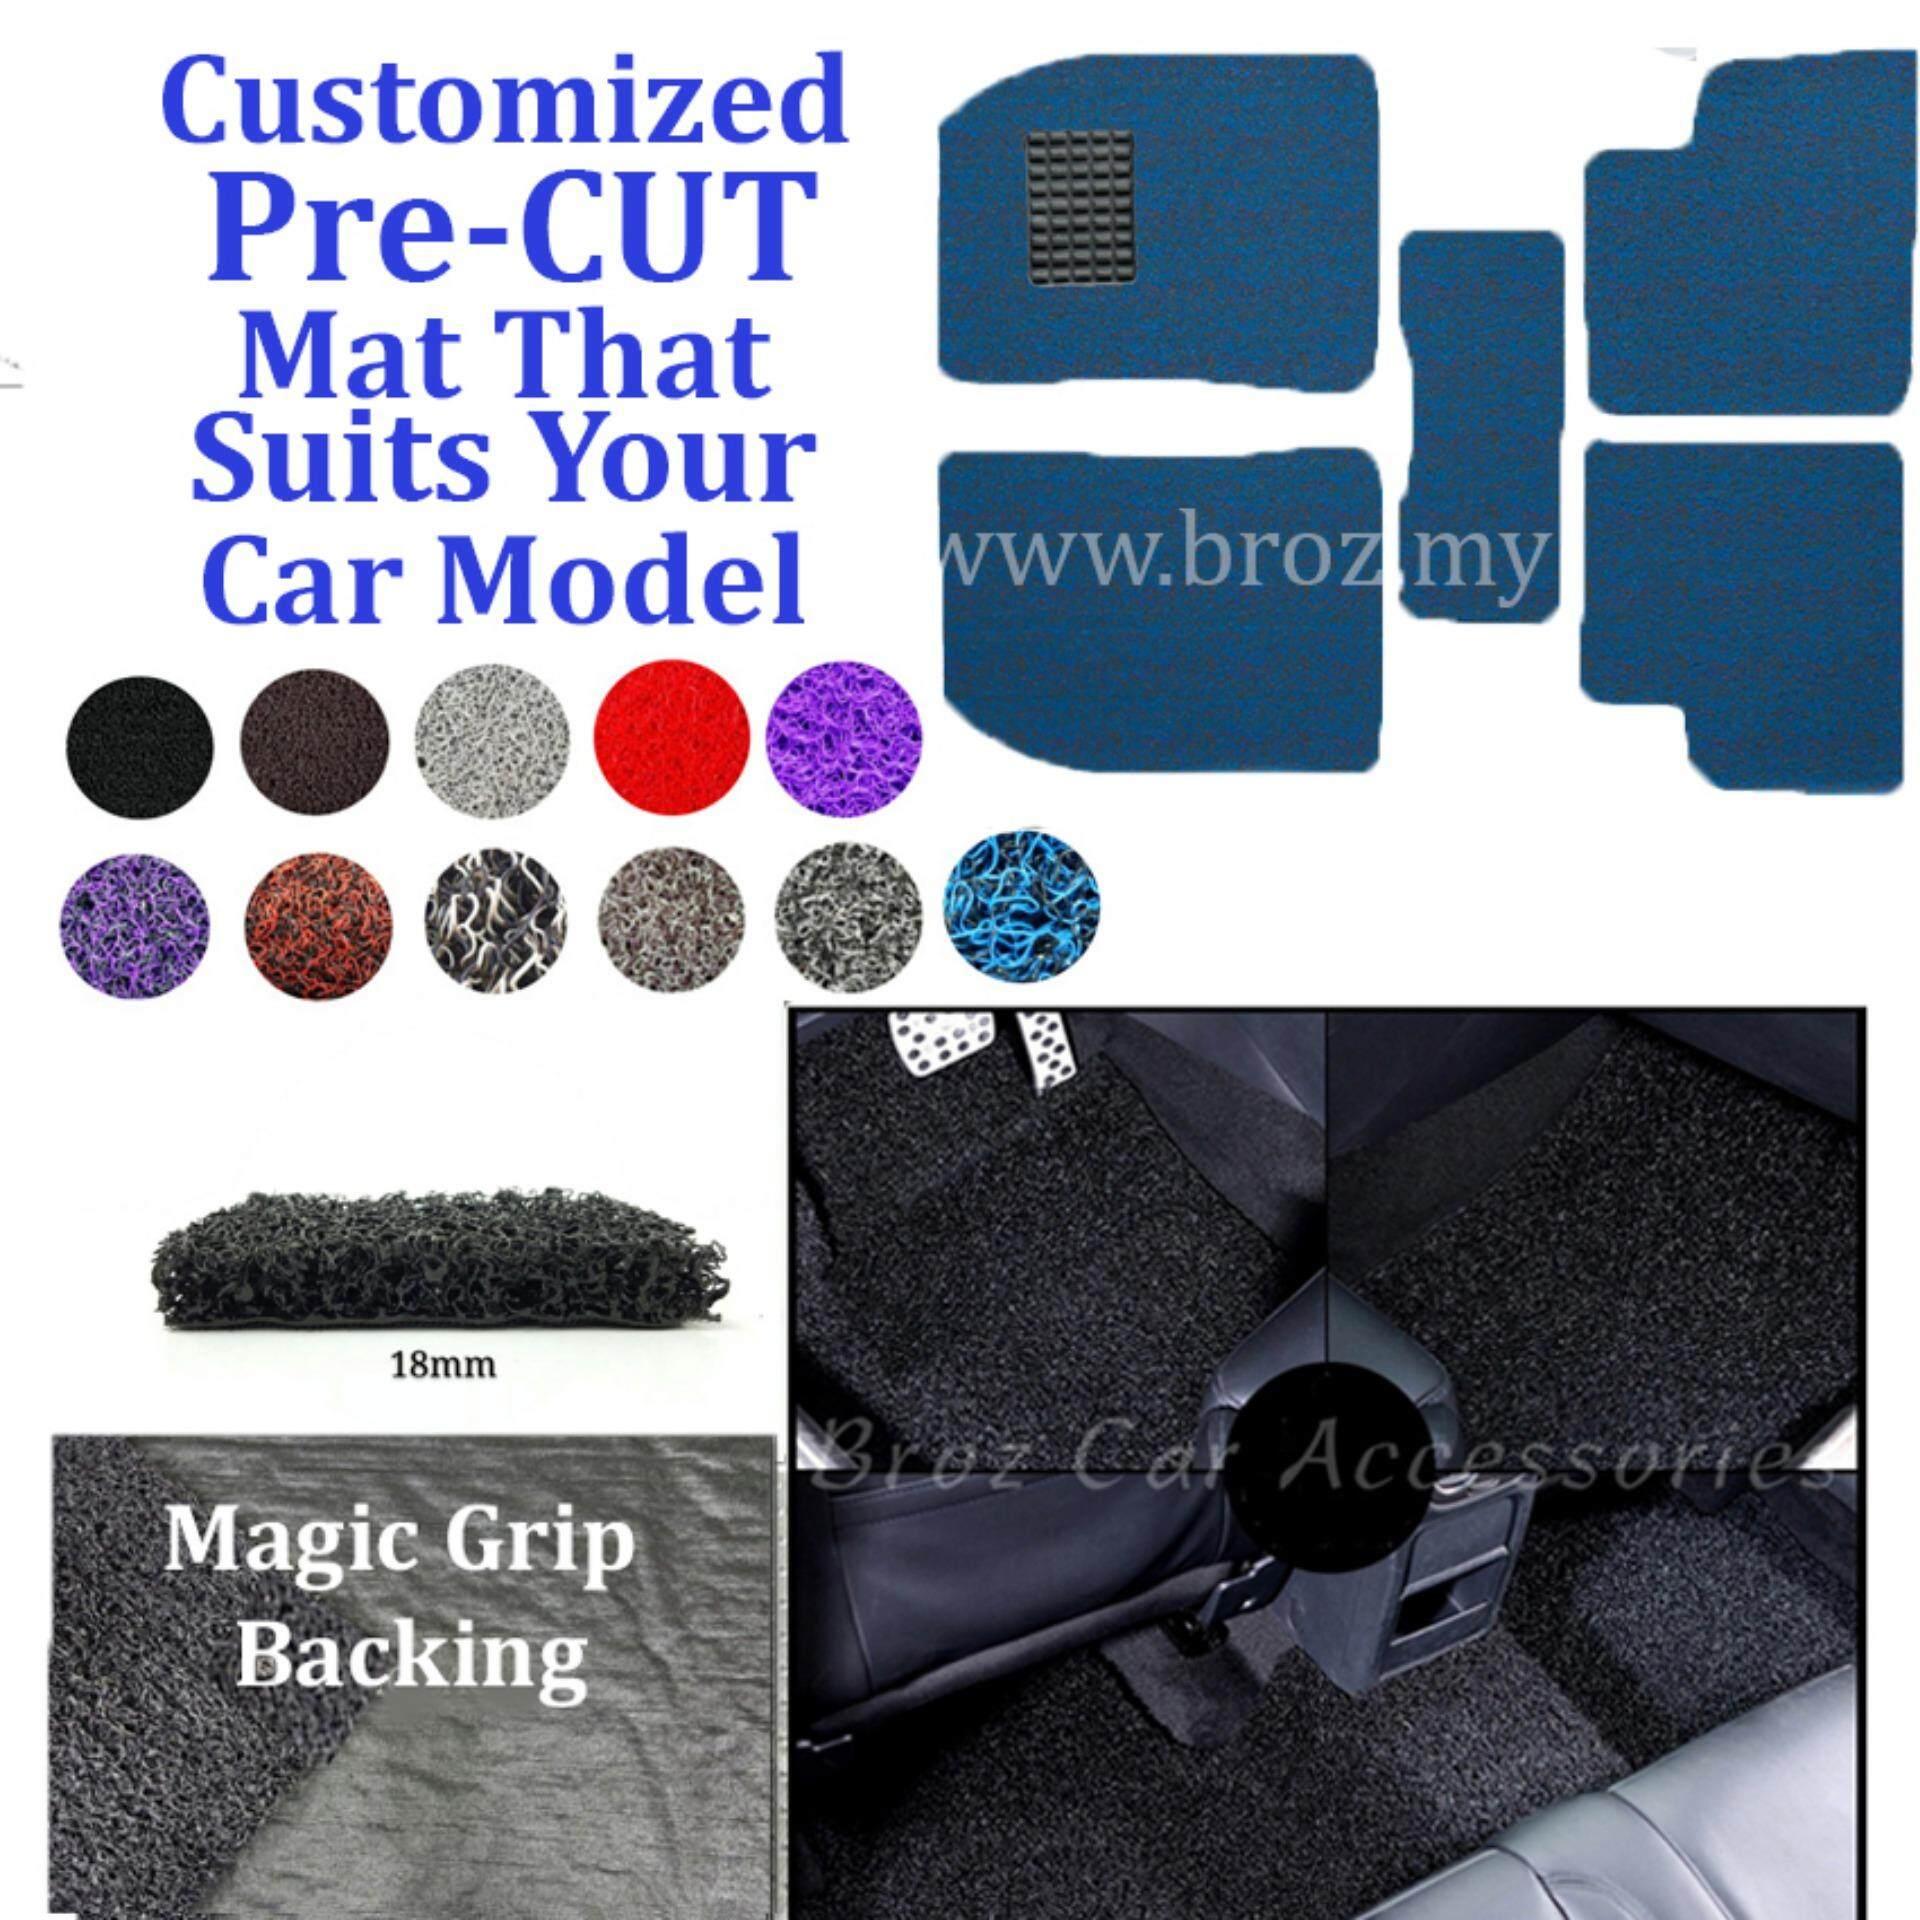 Broz Mercedes E-200 18MM Customized PRE CUT PVC Coil Floor Mat Anti Slip Carpet Magic Grip Backing - Blue Black